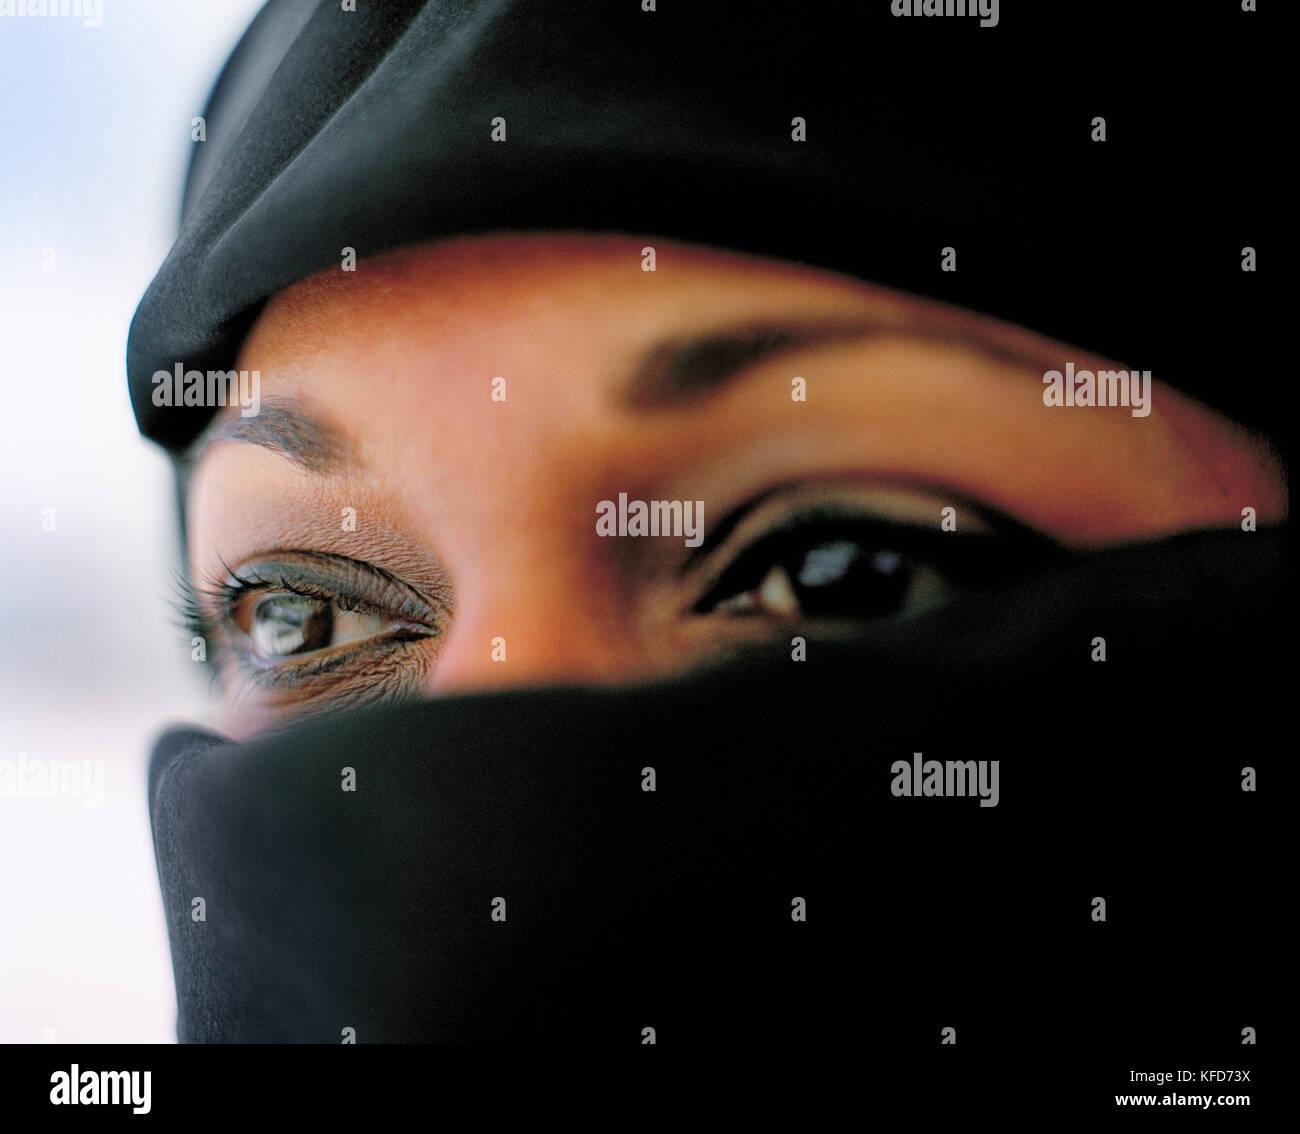 SAUDI ARABIA, Riyadh, close-up of young woman wearing hijab - Stock Image